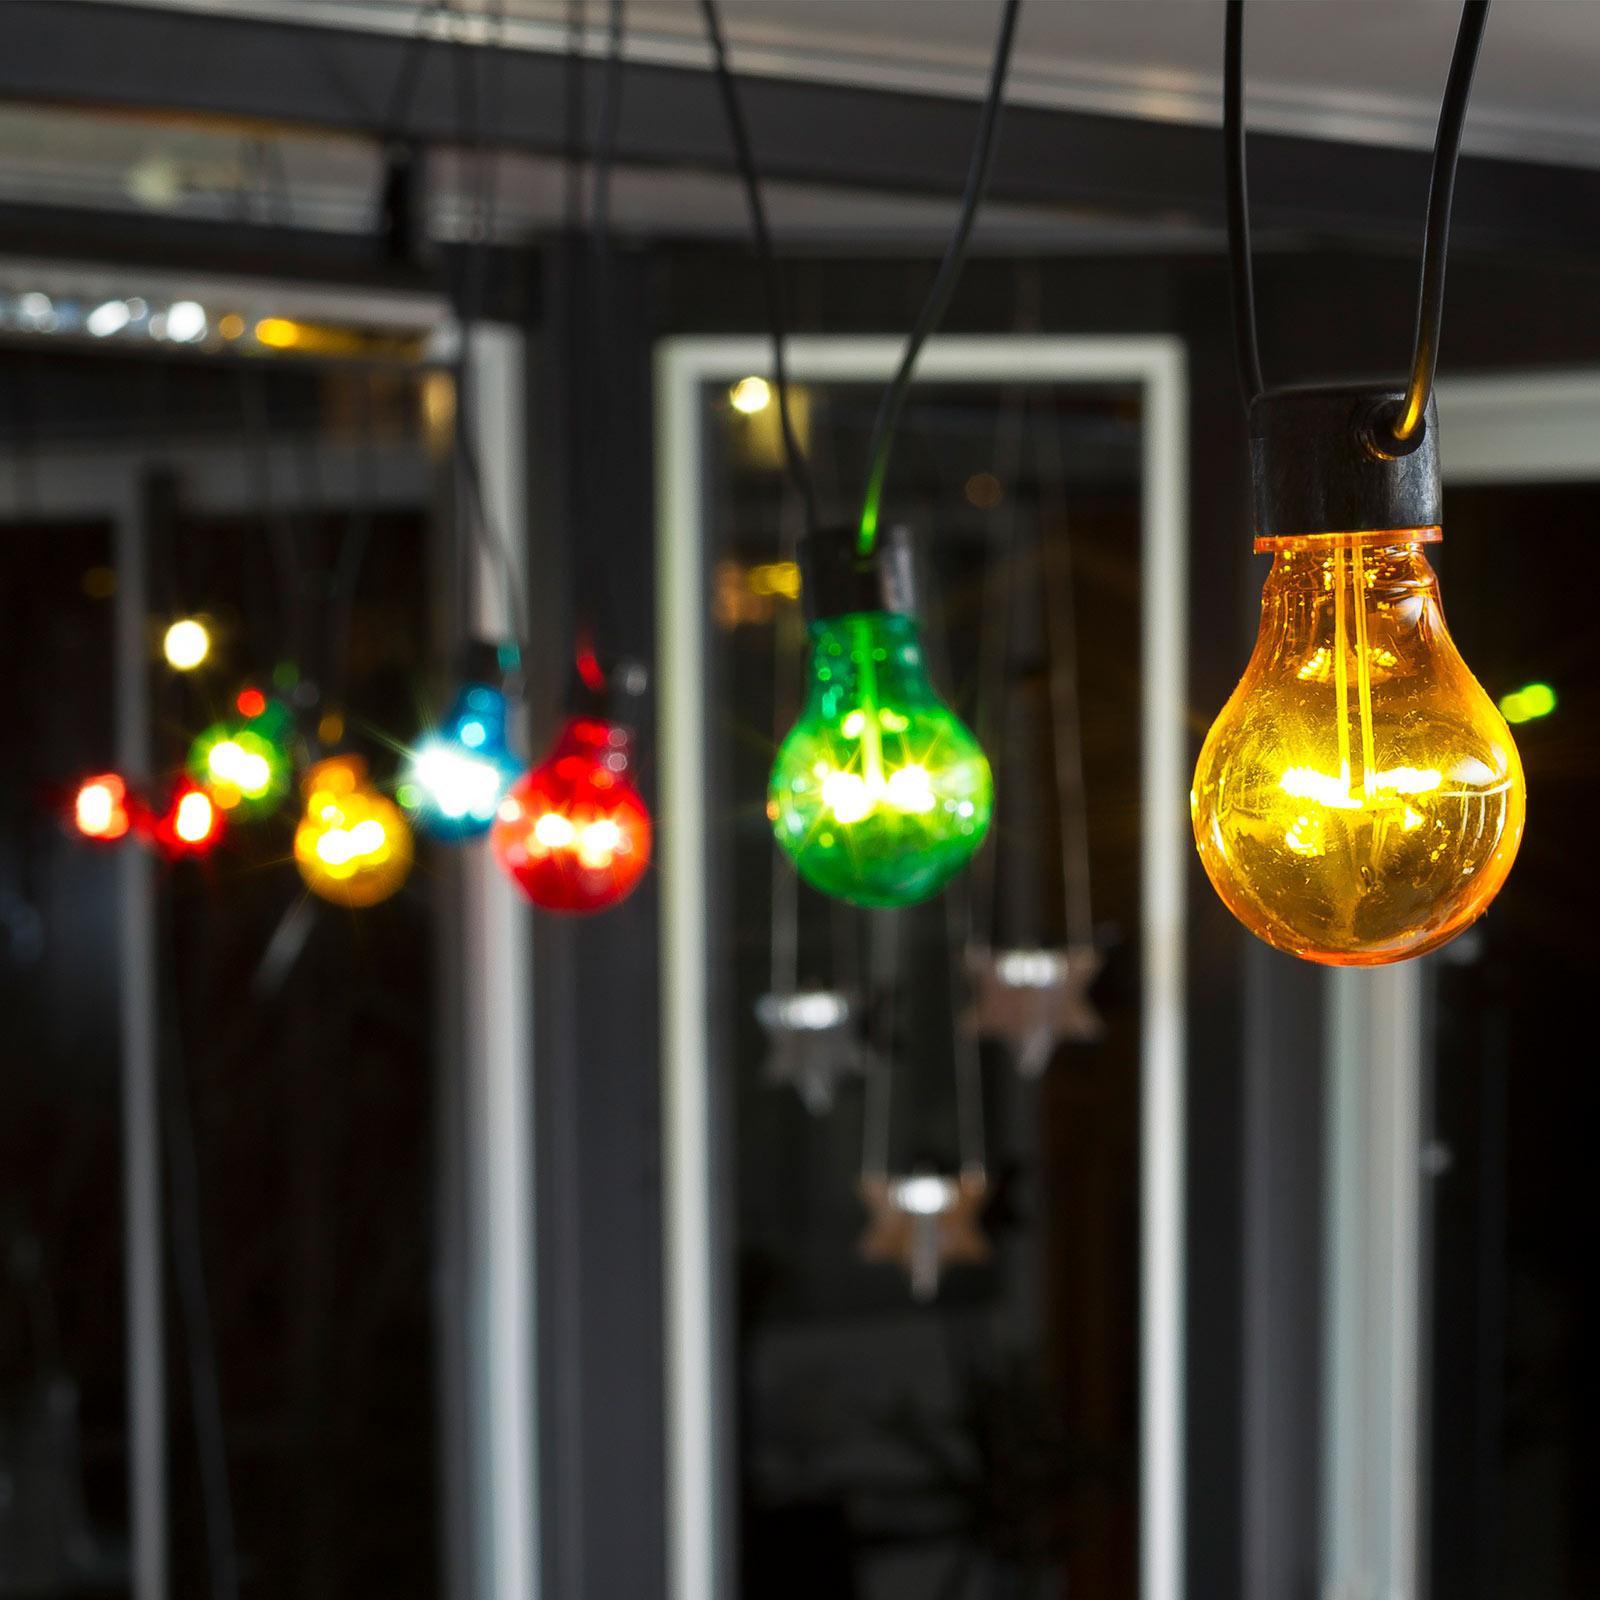 LED-ljusslinga Biergarten grundset, färgglad